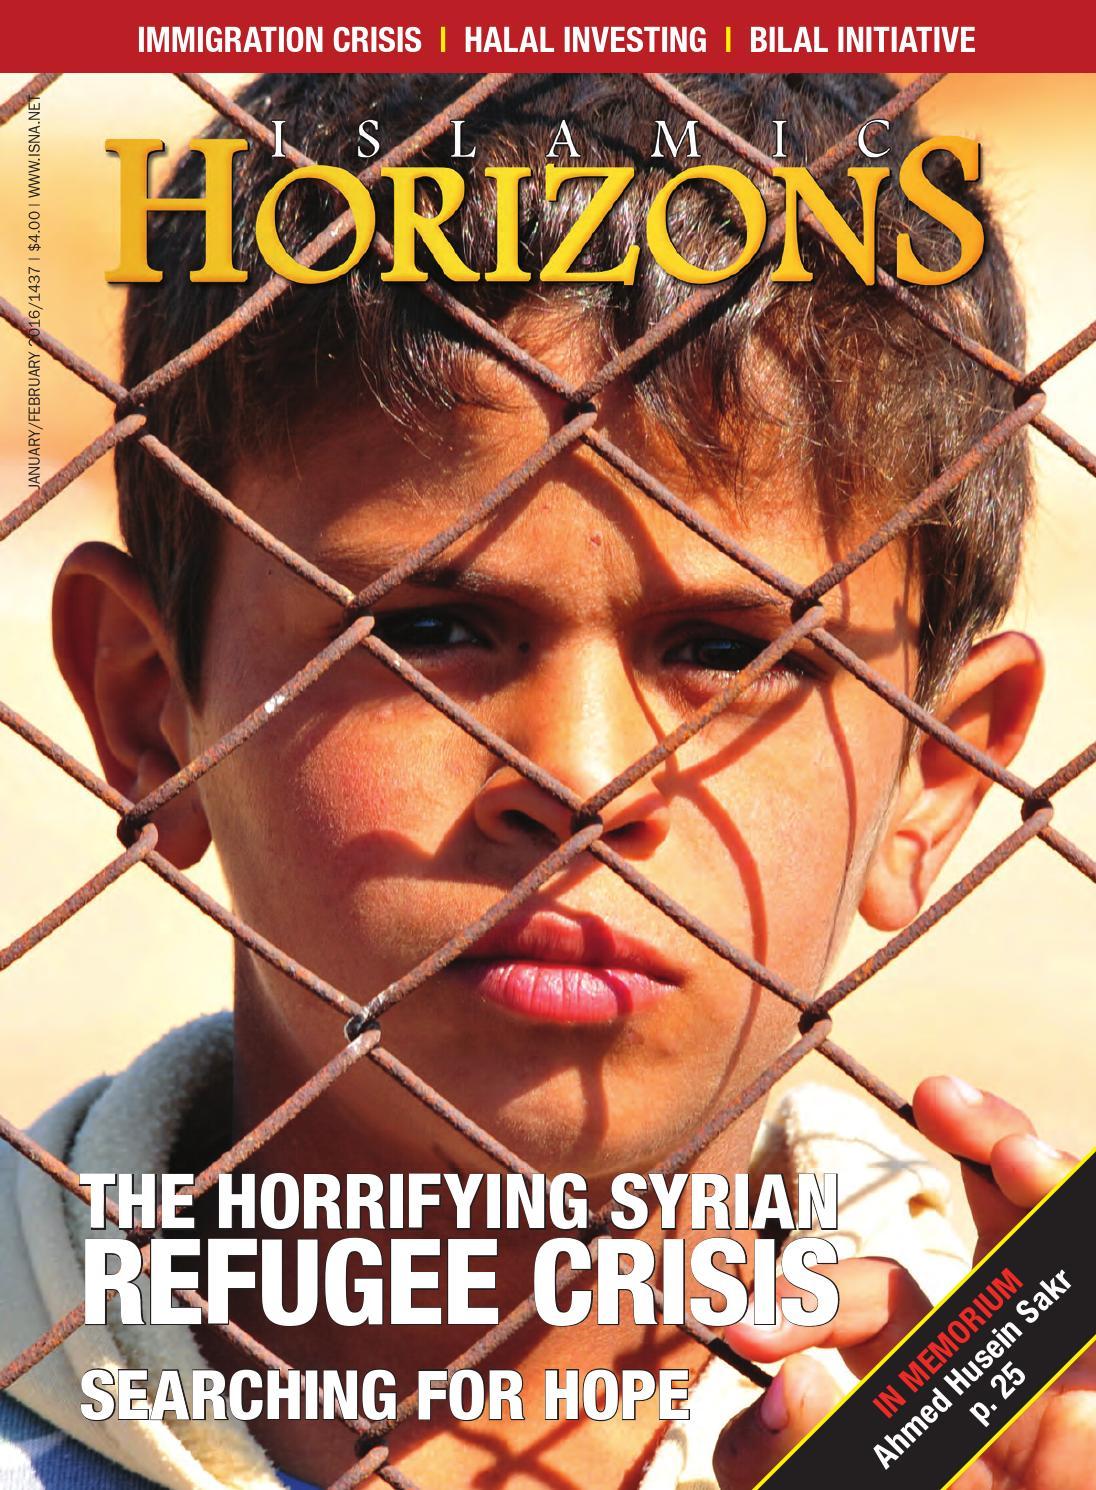 Islamic Horizons Jan/Feb 2016 by Islamic Society of North